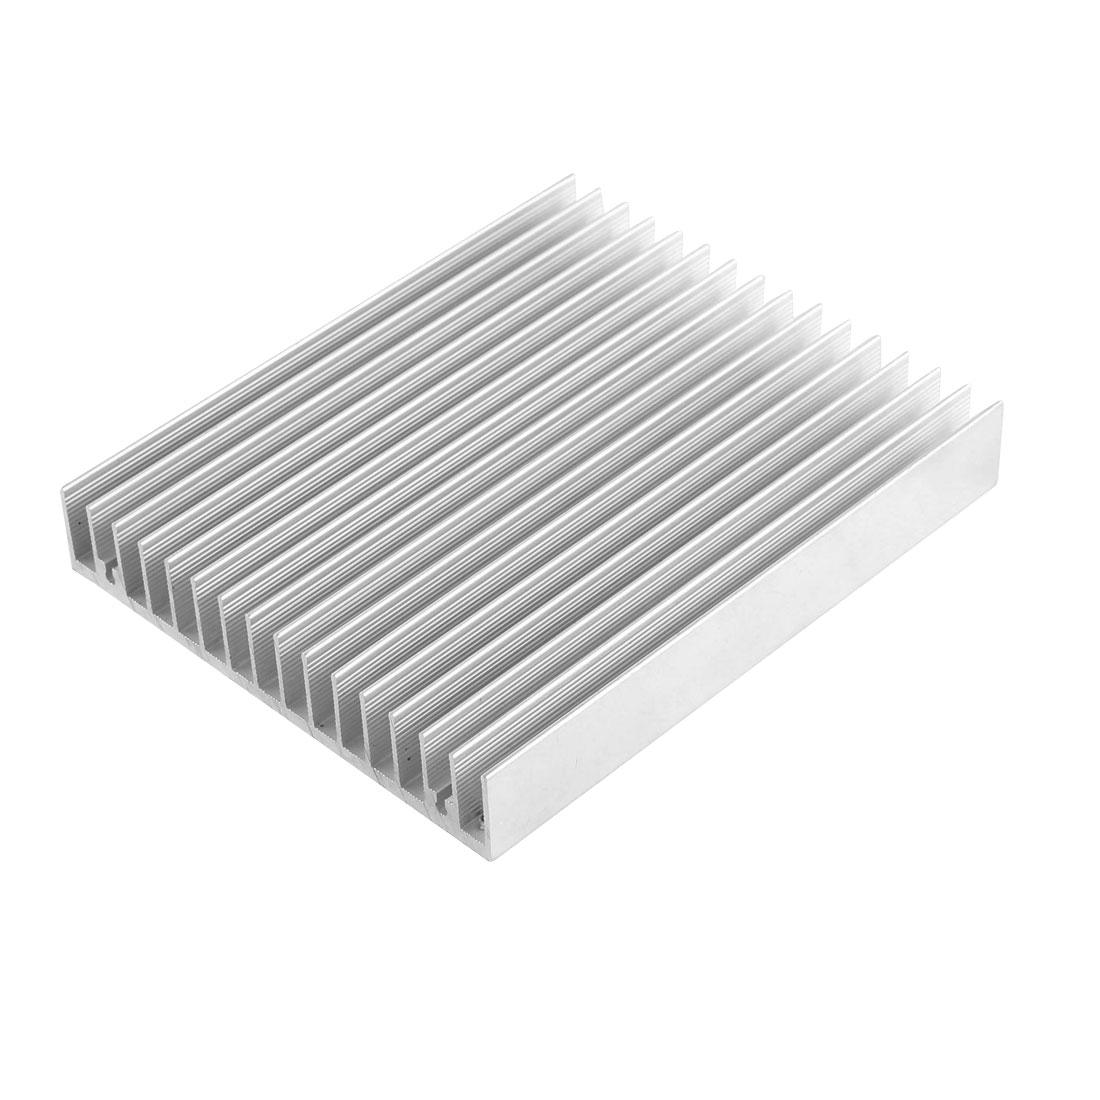 Silver Tone Aluminum Radiator Diffuse Heat Sink Heatsink Cooling Fin 120 x 100 x 20mm